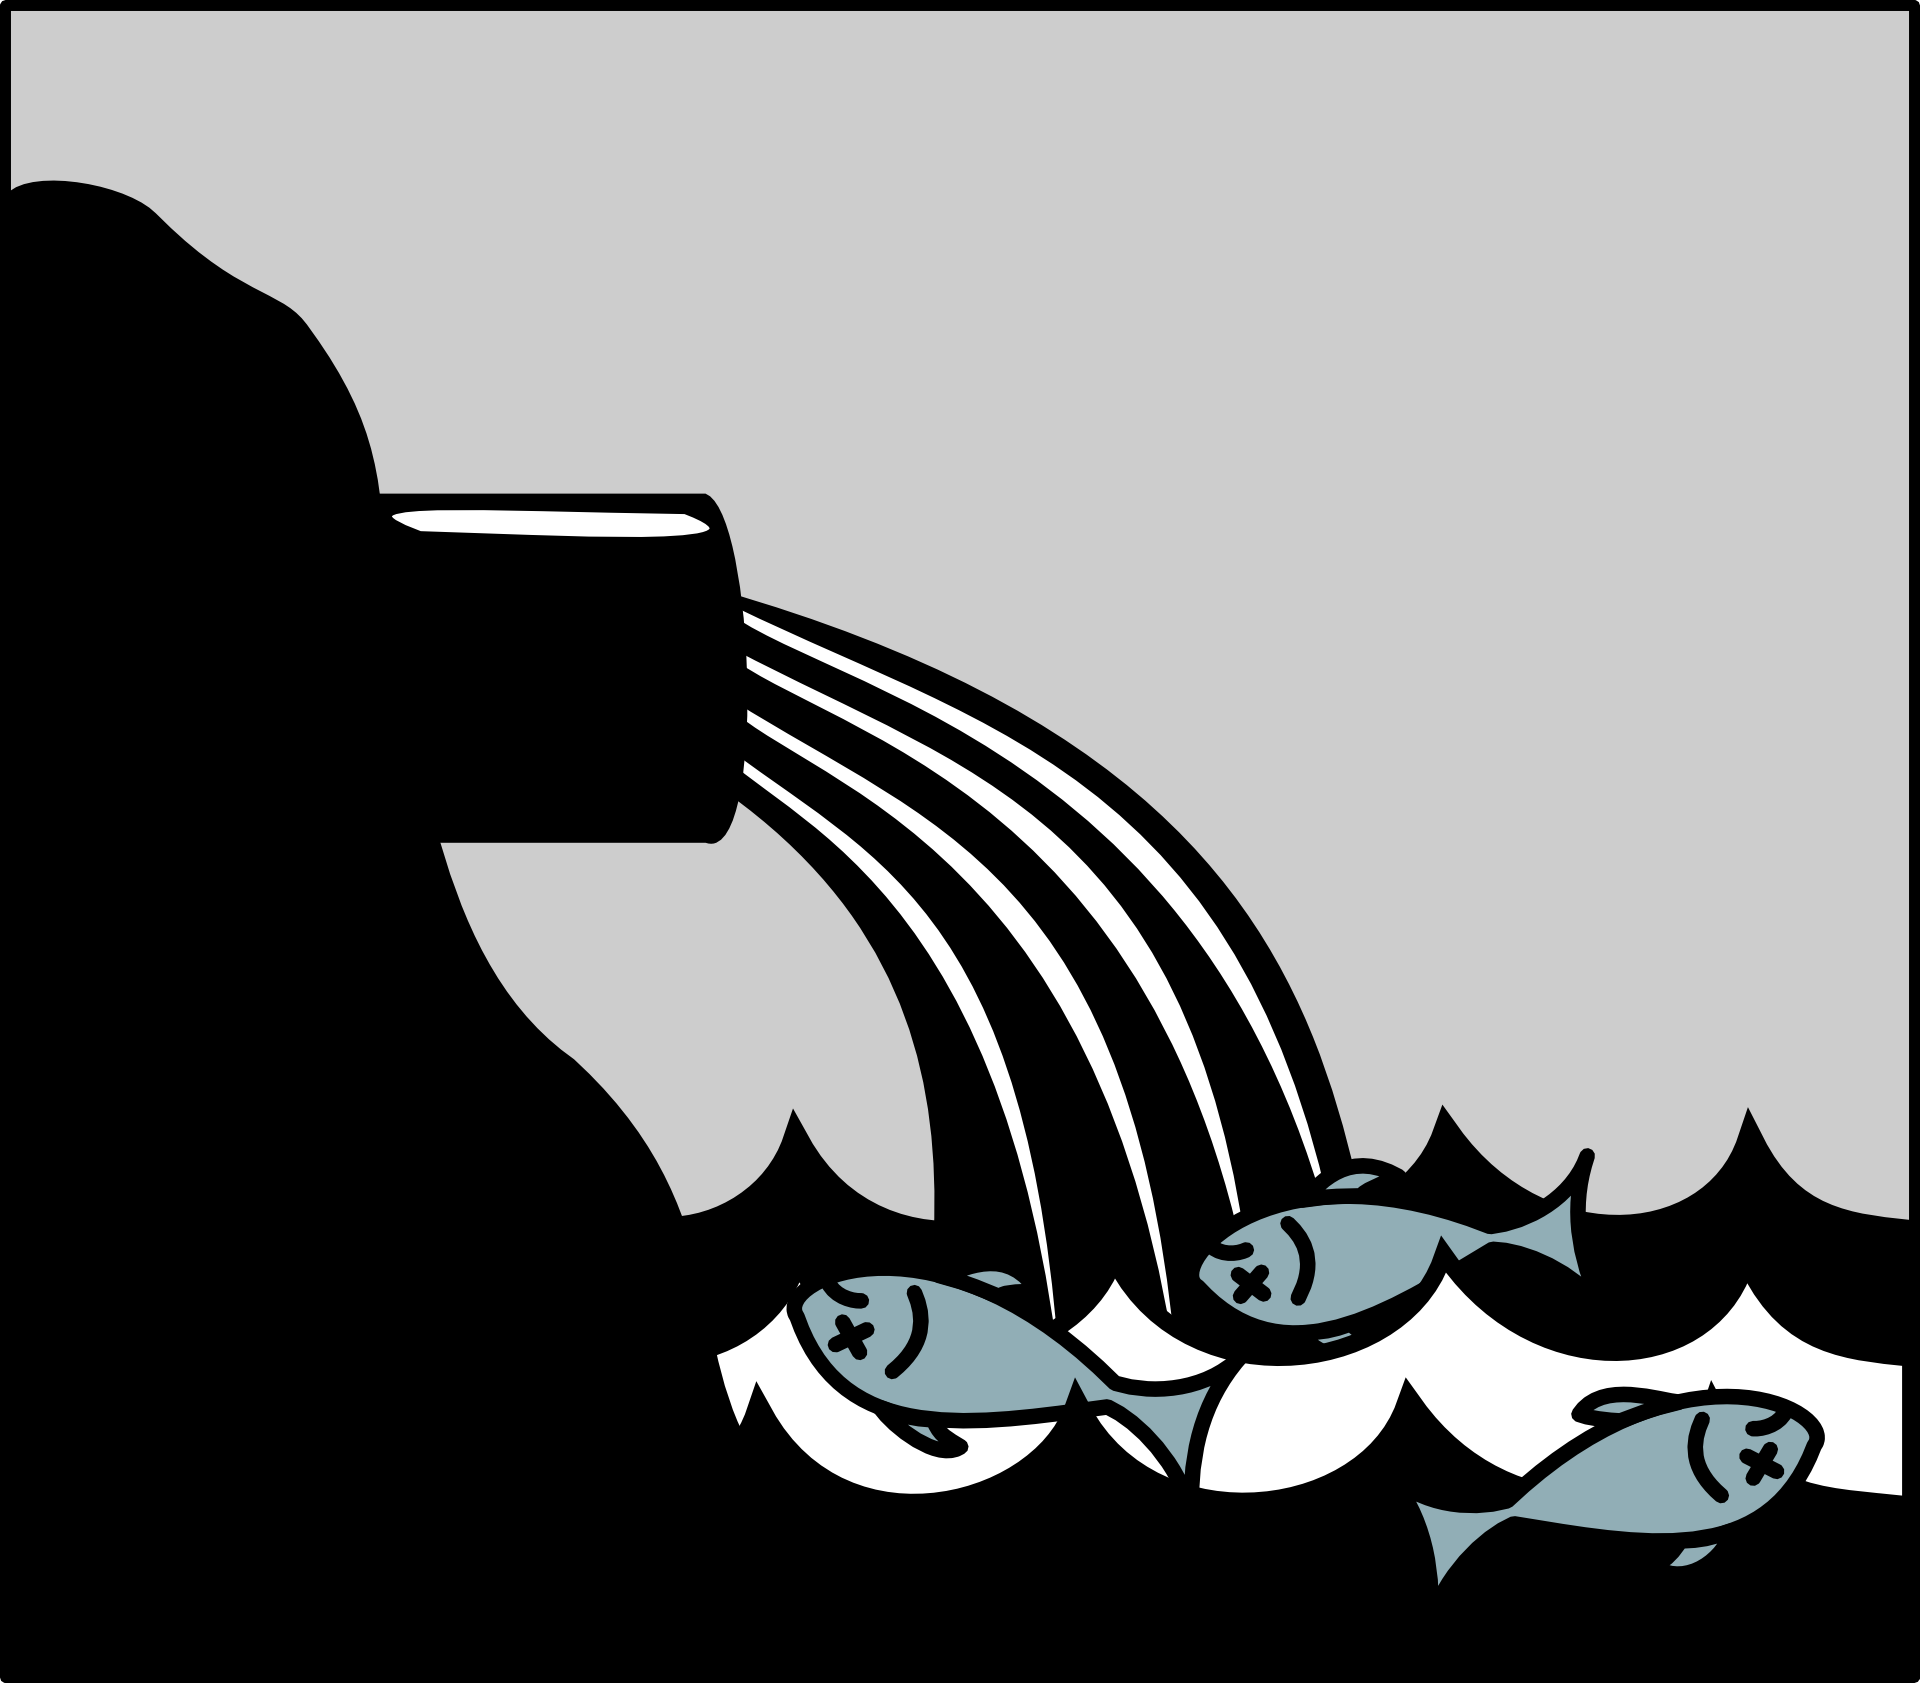 Toxic water, poisoned fish, mercury, heavy metal